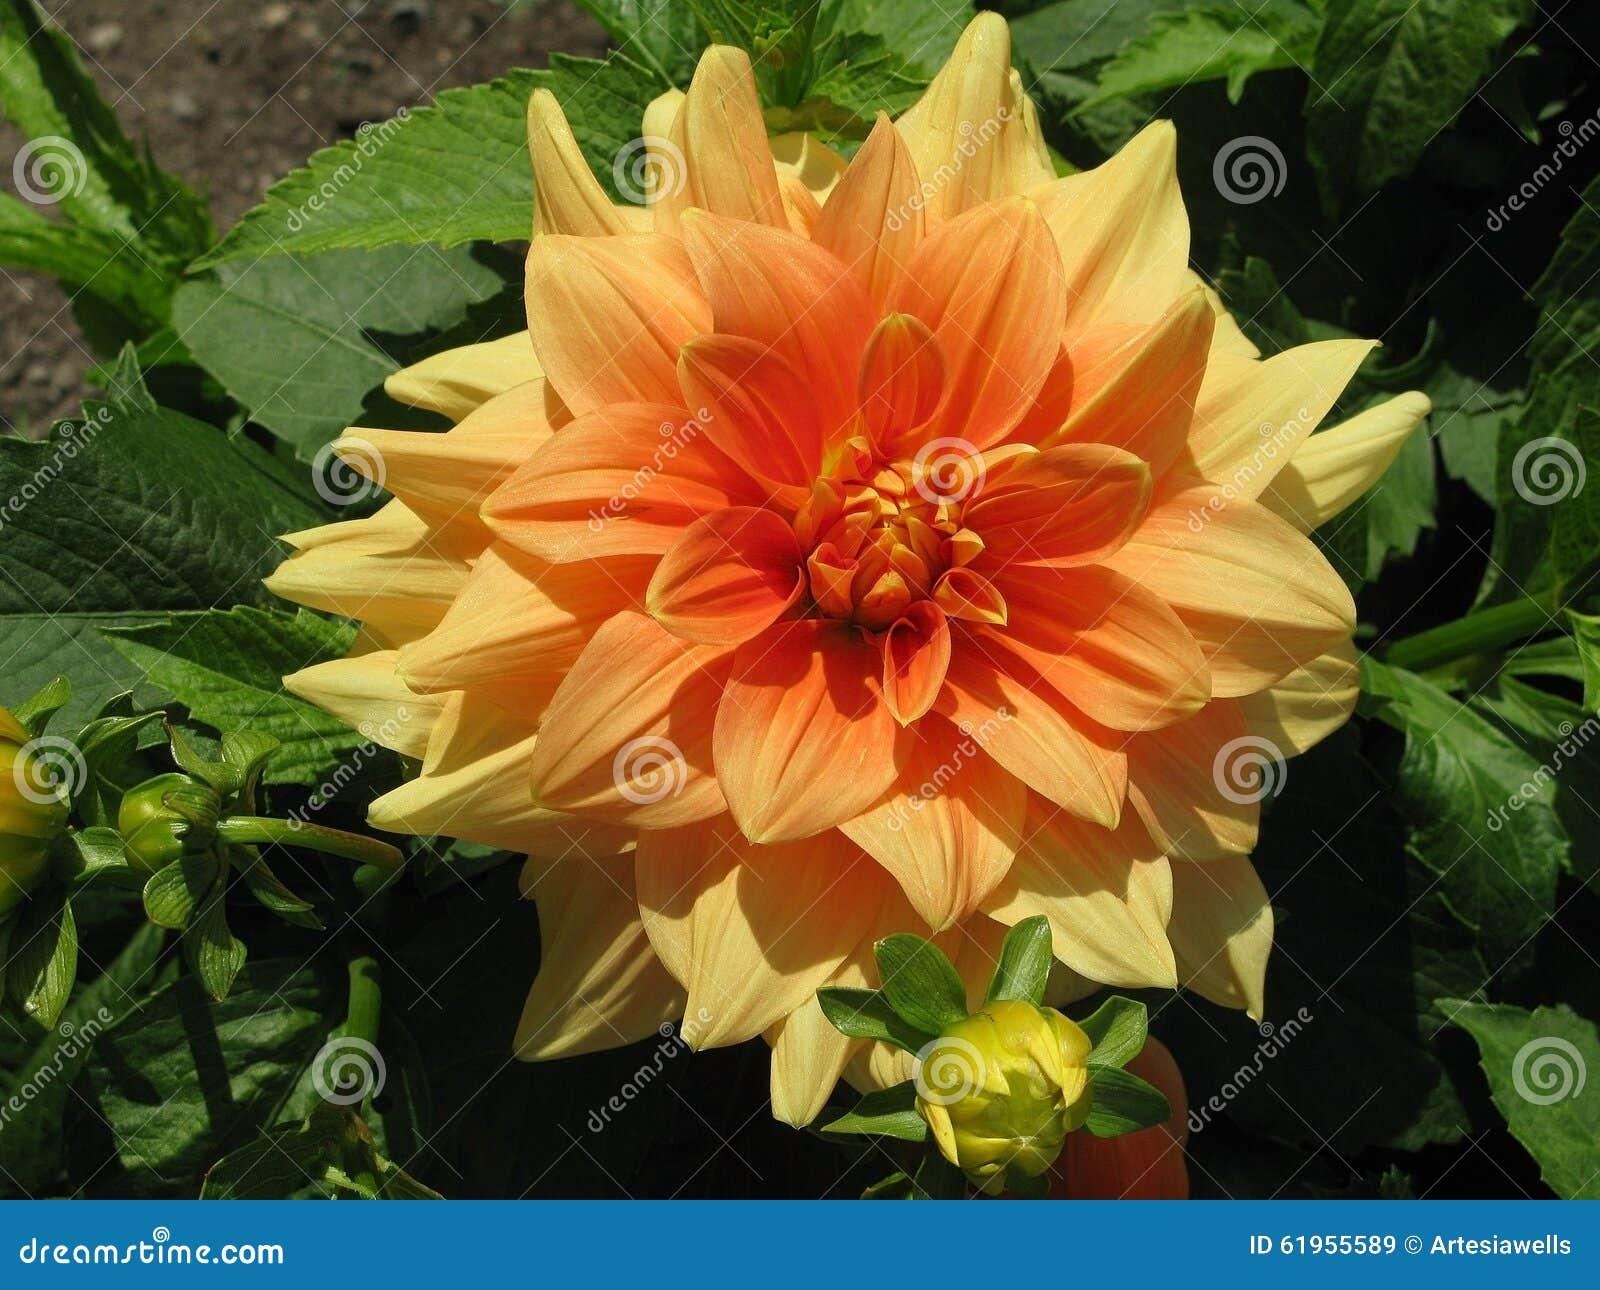 Yellow Orange Dahlia Flower Stock Image Image Of Blossoming